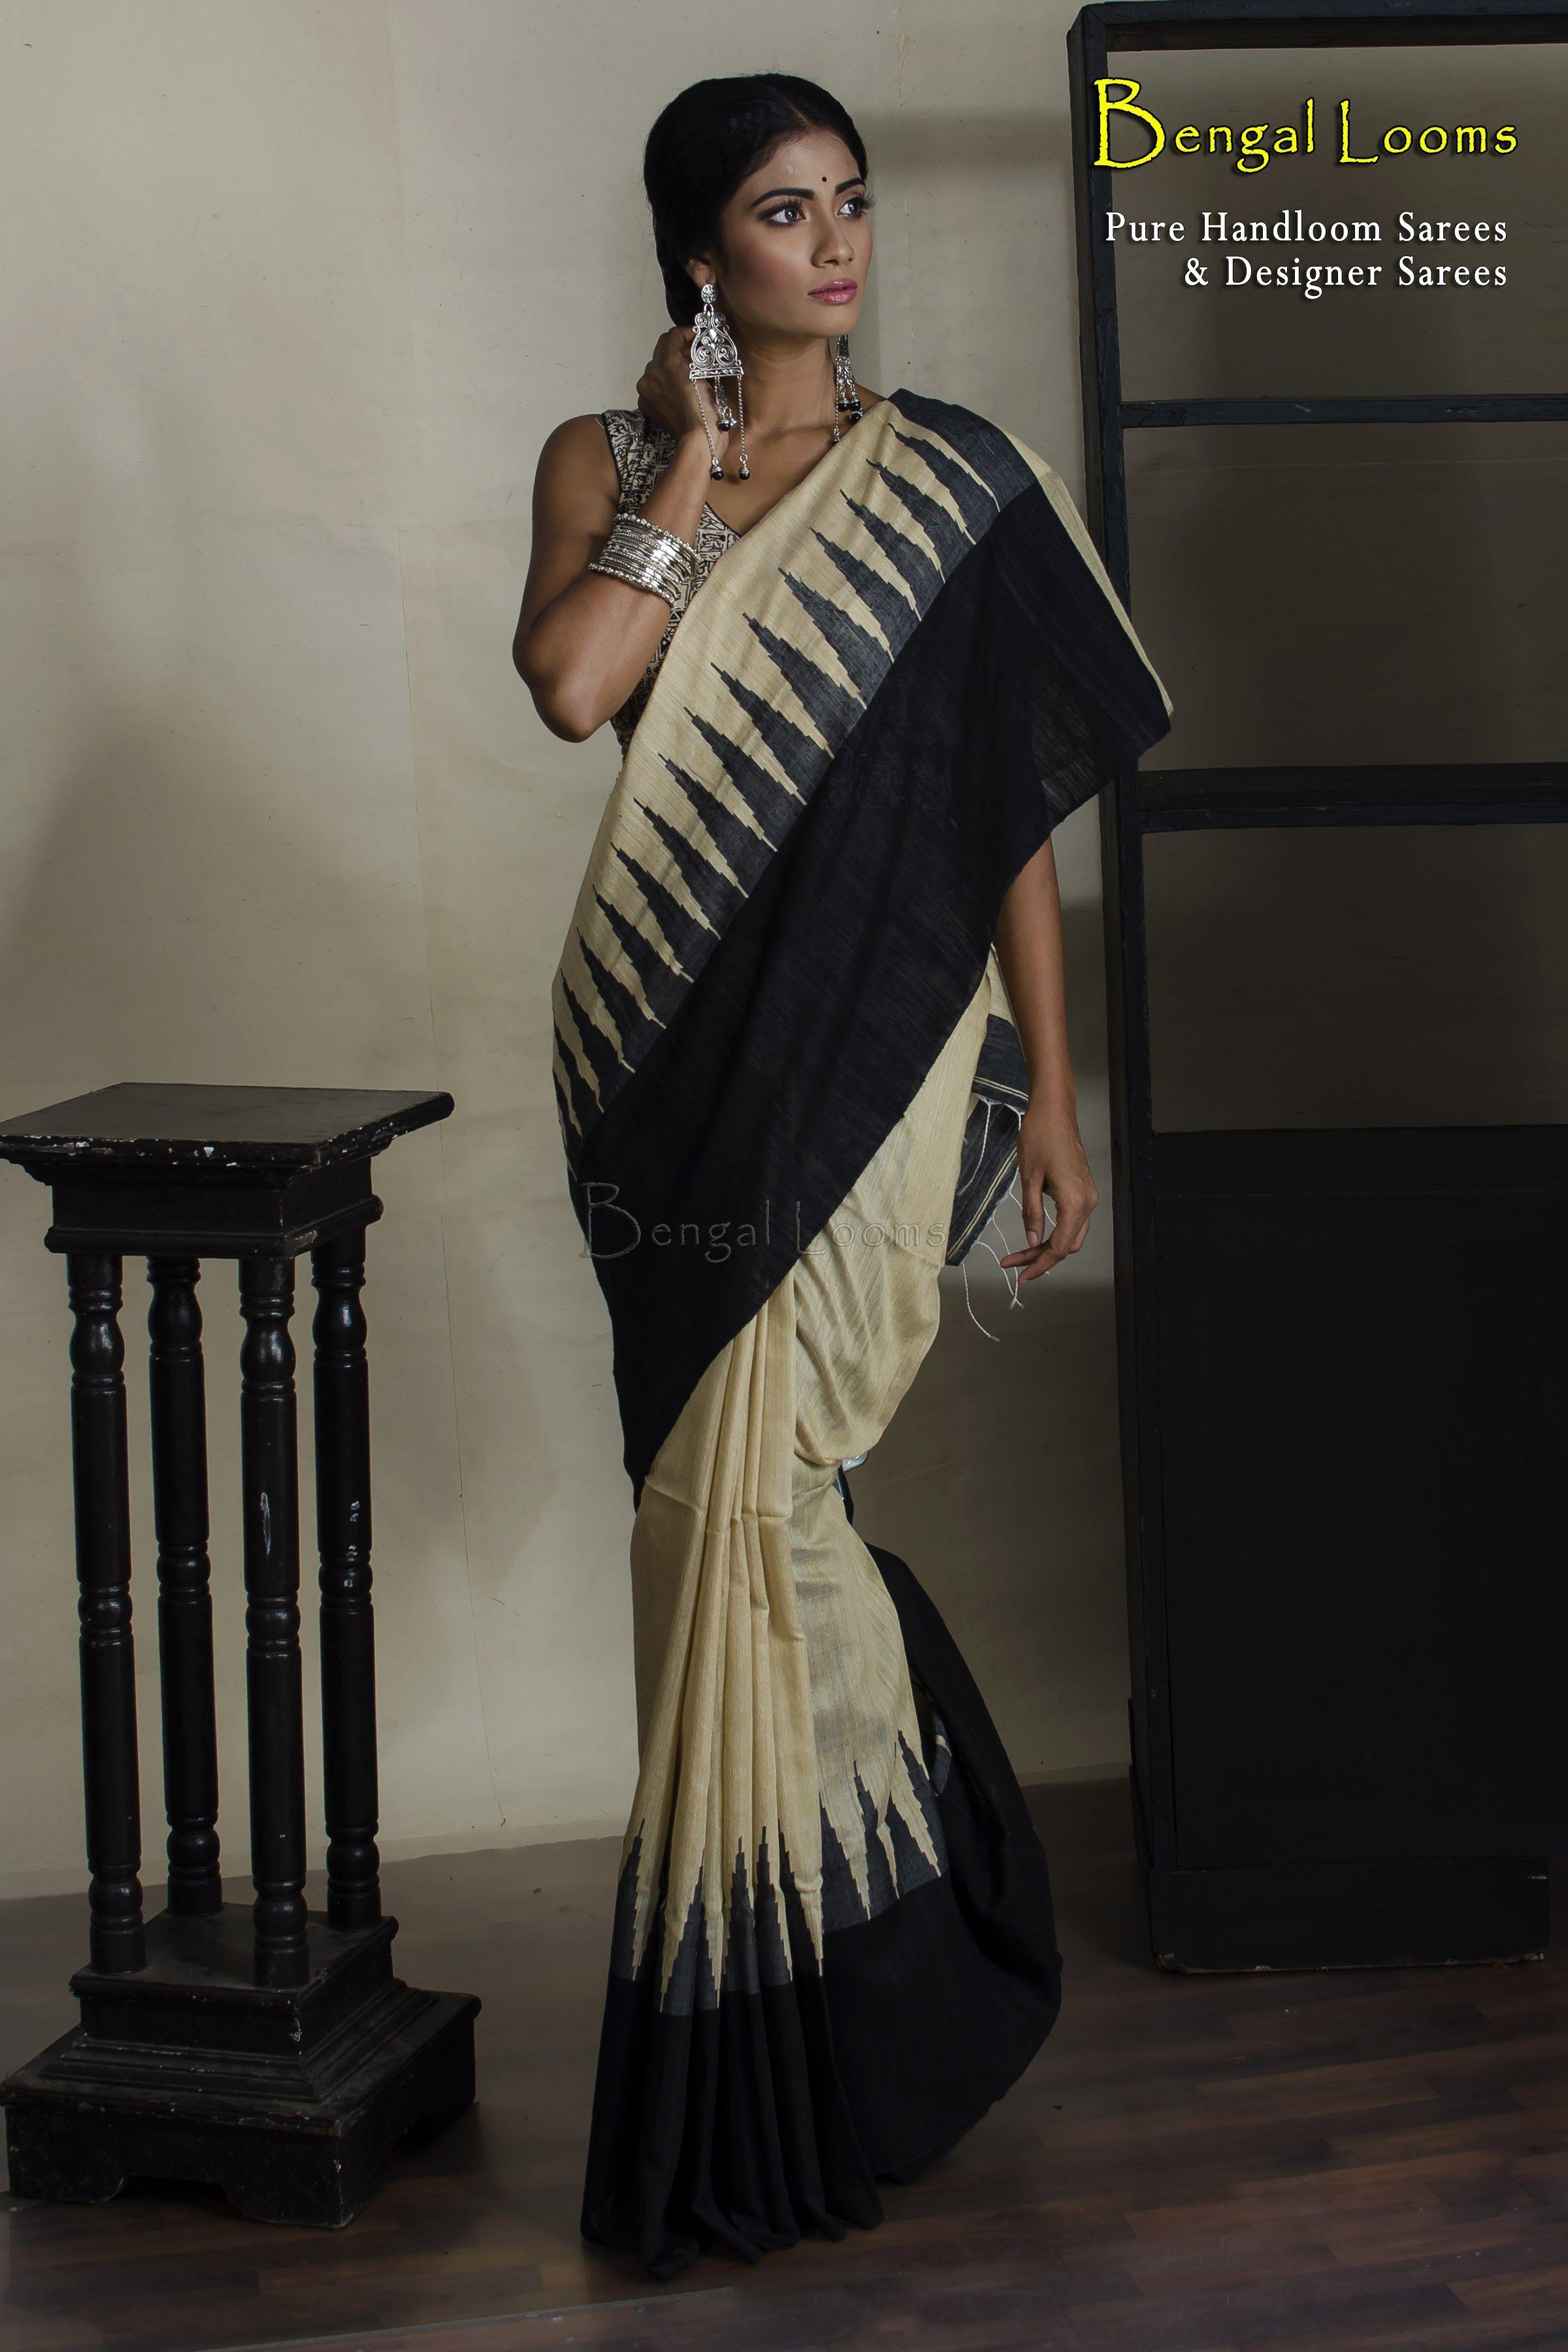 f3ae153e11280a Handloom Khadi Tussar Silk Temple Border Saree in beige and black color  combination